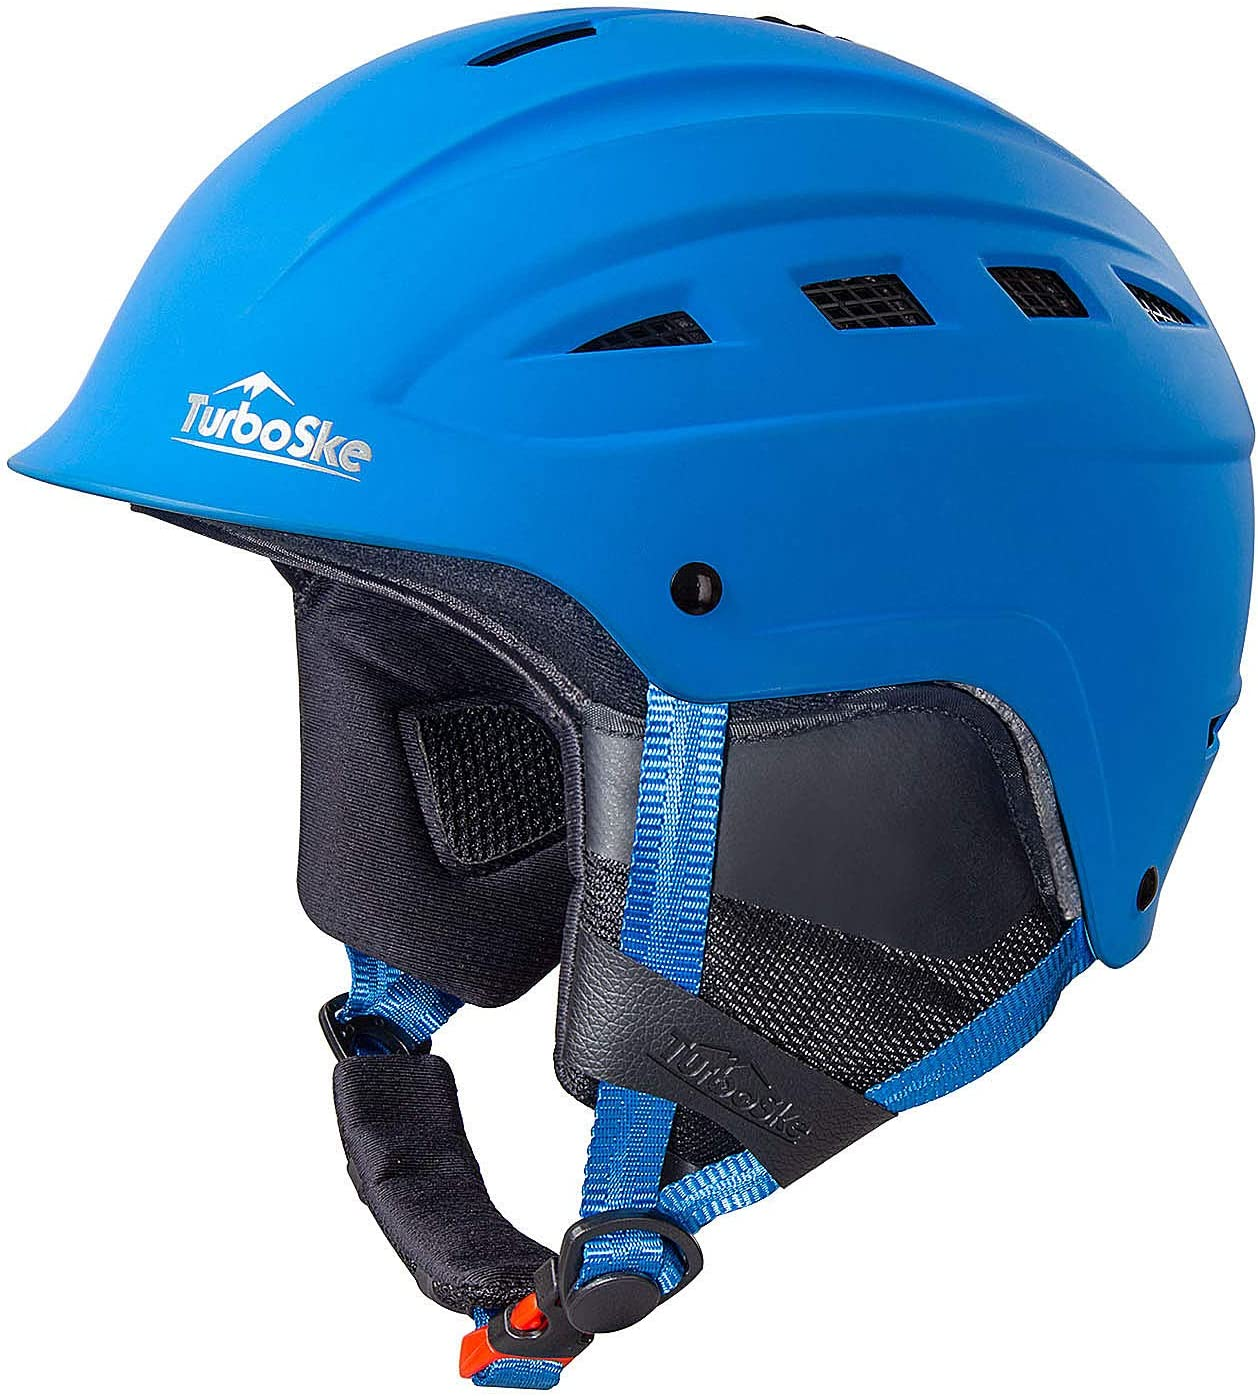 TurboSke Ski Helmet, Snowboard Helmet, Snow Sports Helmet, Audio Compatible for Men Women and Youth : Sports & Outdoors